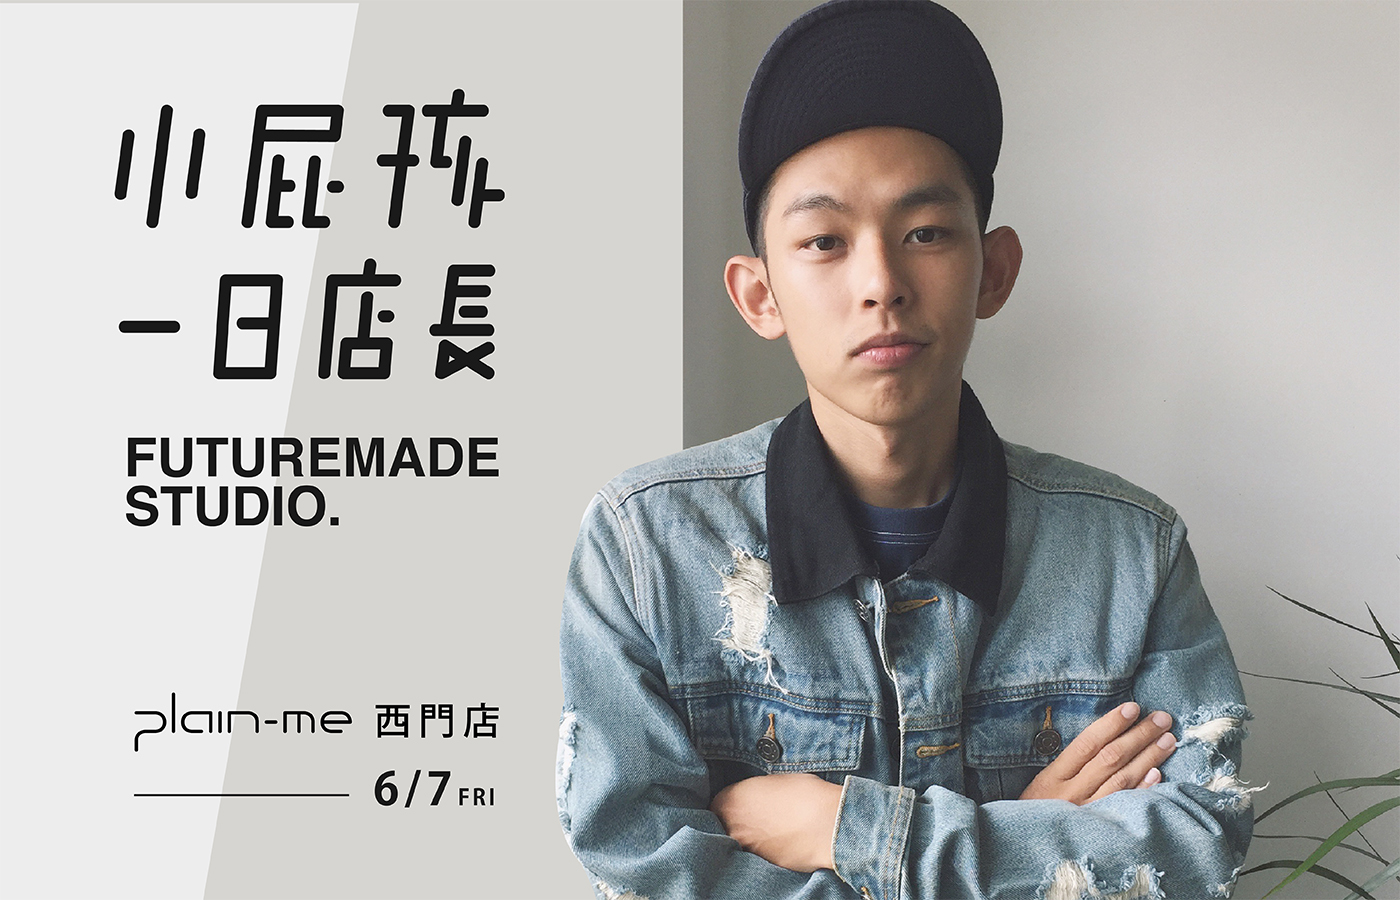 futuremade 台北,futuremade,futuremade台灣,小屁孩,馬來西亞,FUTUREMADE STUDIO,Xiao Pi Hai